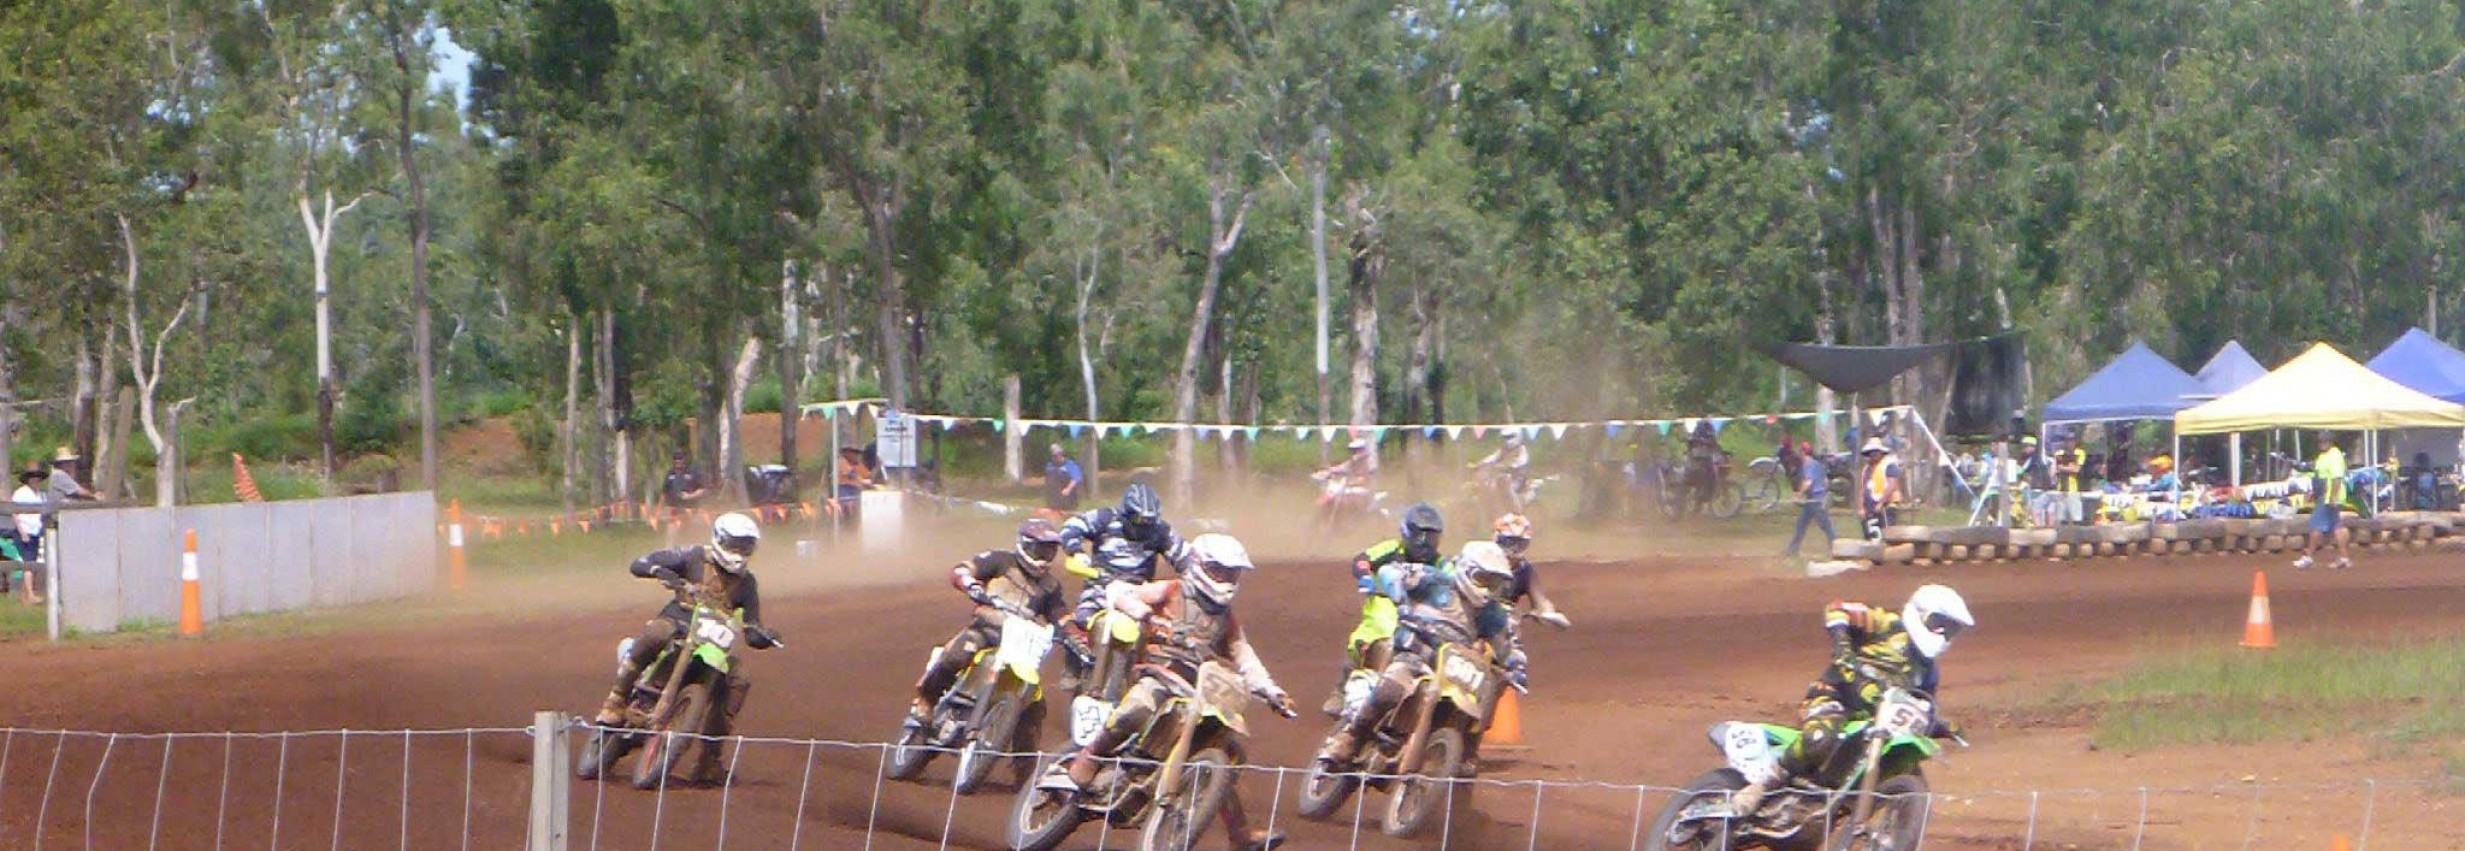 Drays Park – Whitsunday Dirt Riders Club